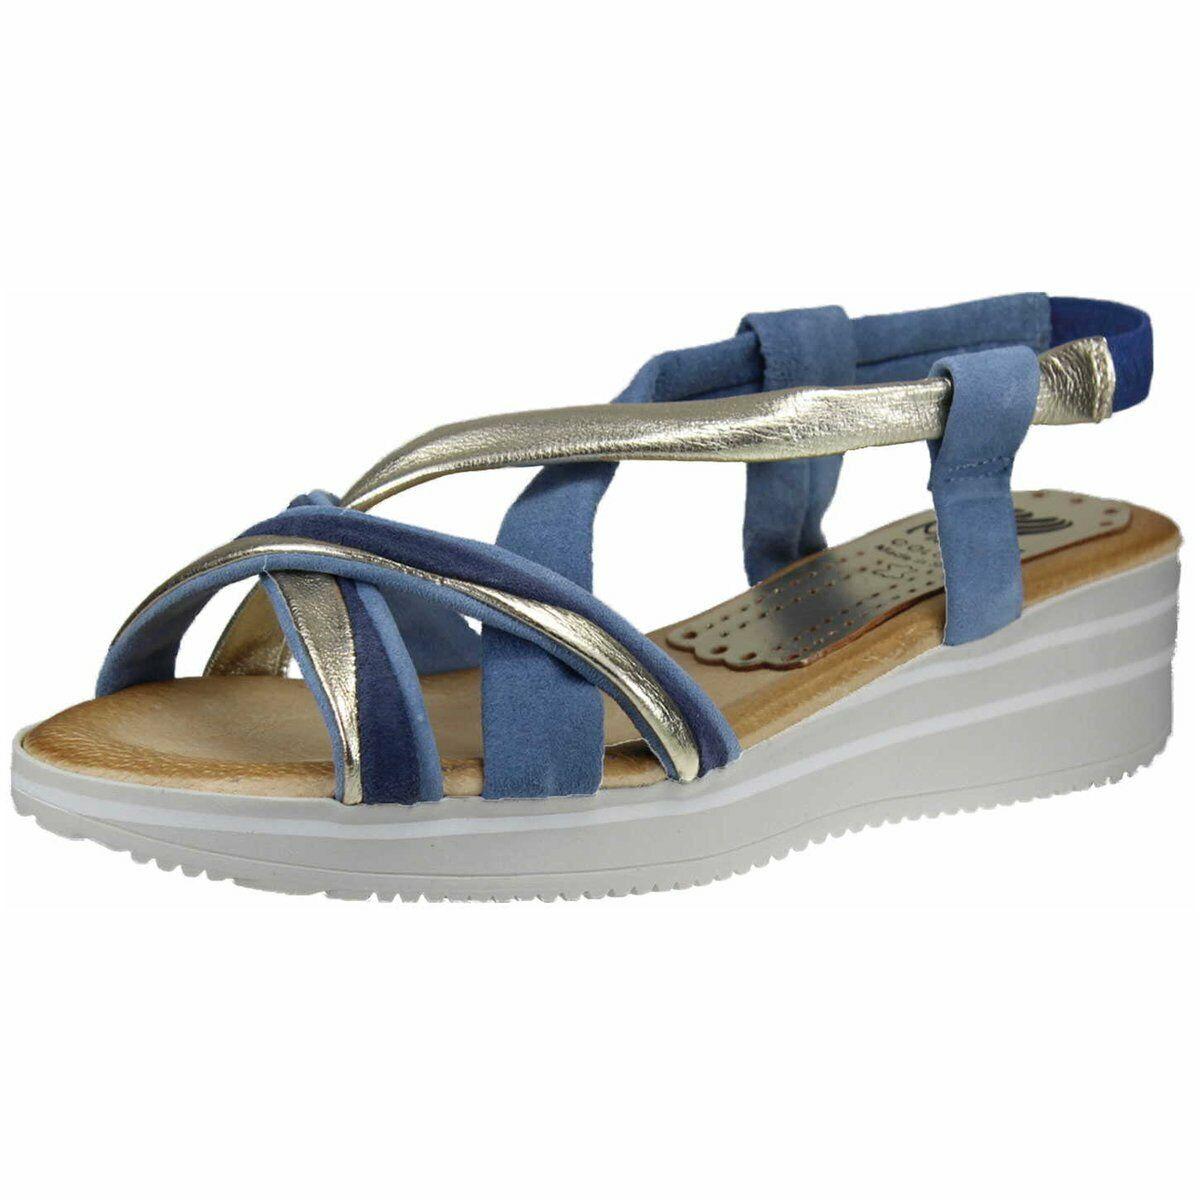 Marila Damen Sandaletten multiBlau (blau-hellGold) 615S LU-25 blau 681099